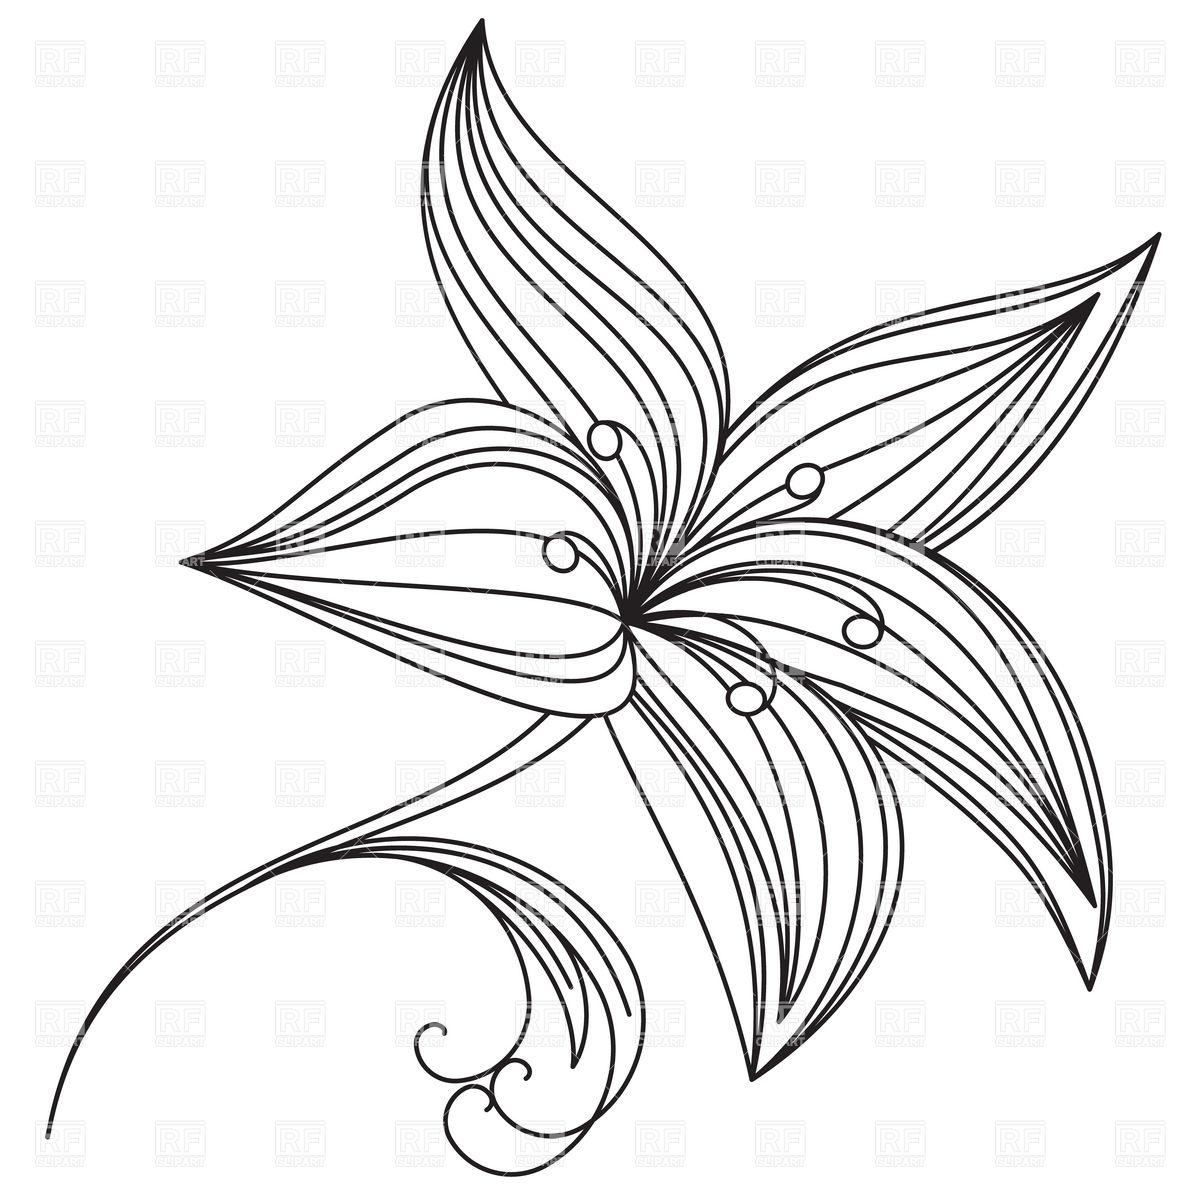 1200x1200 Drawn Lily Beautiful Flower